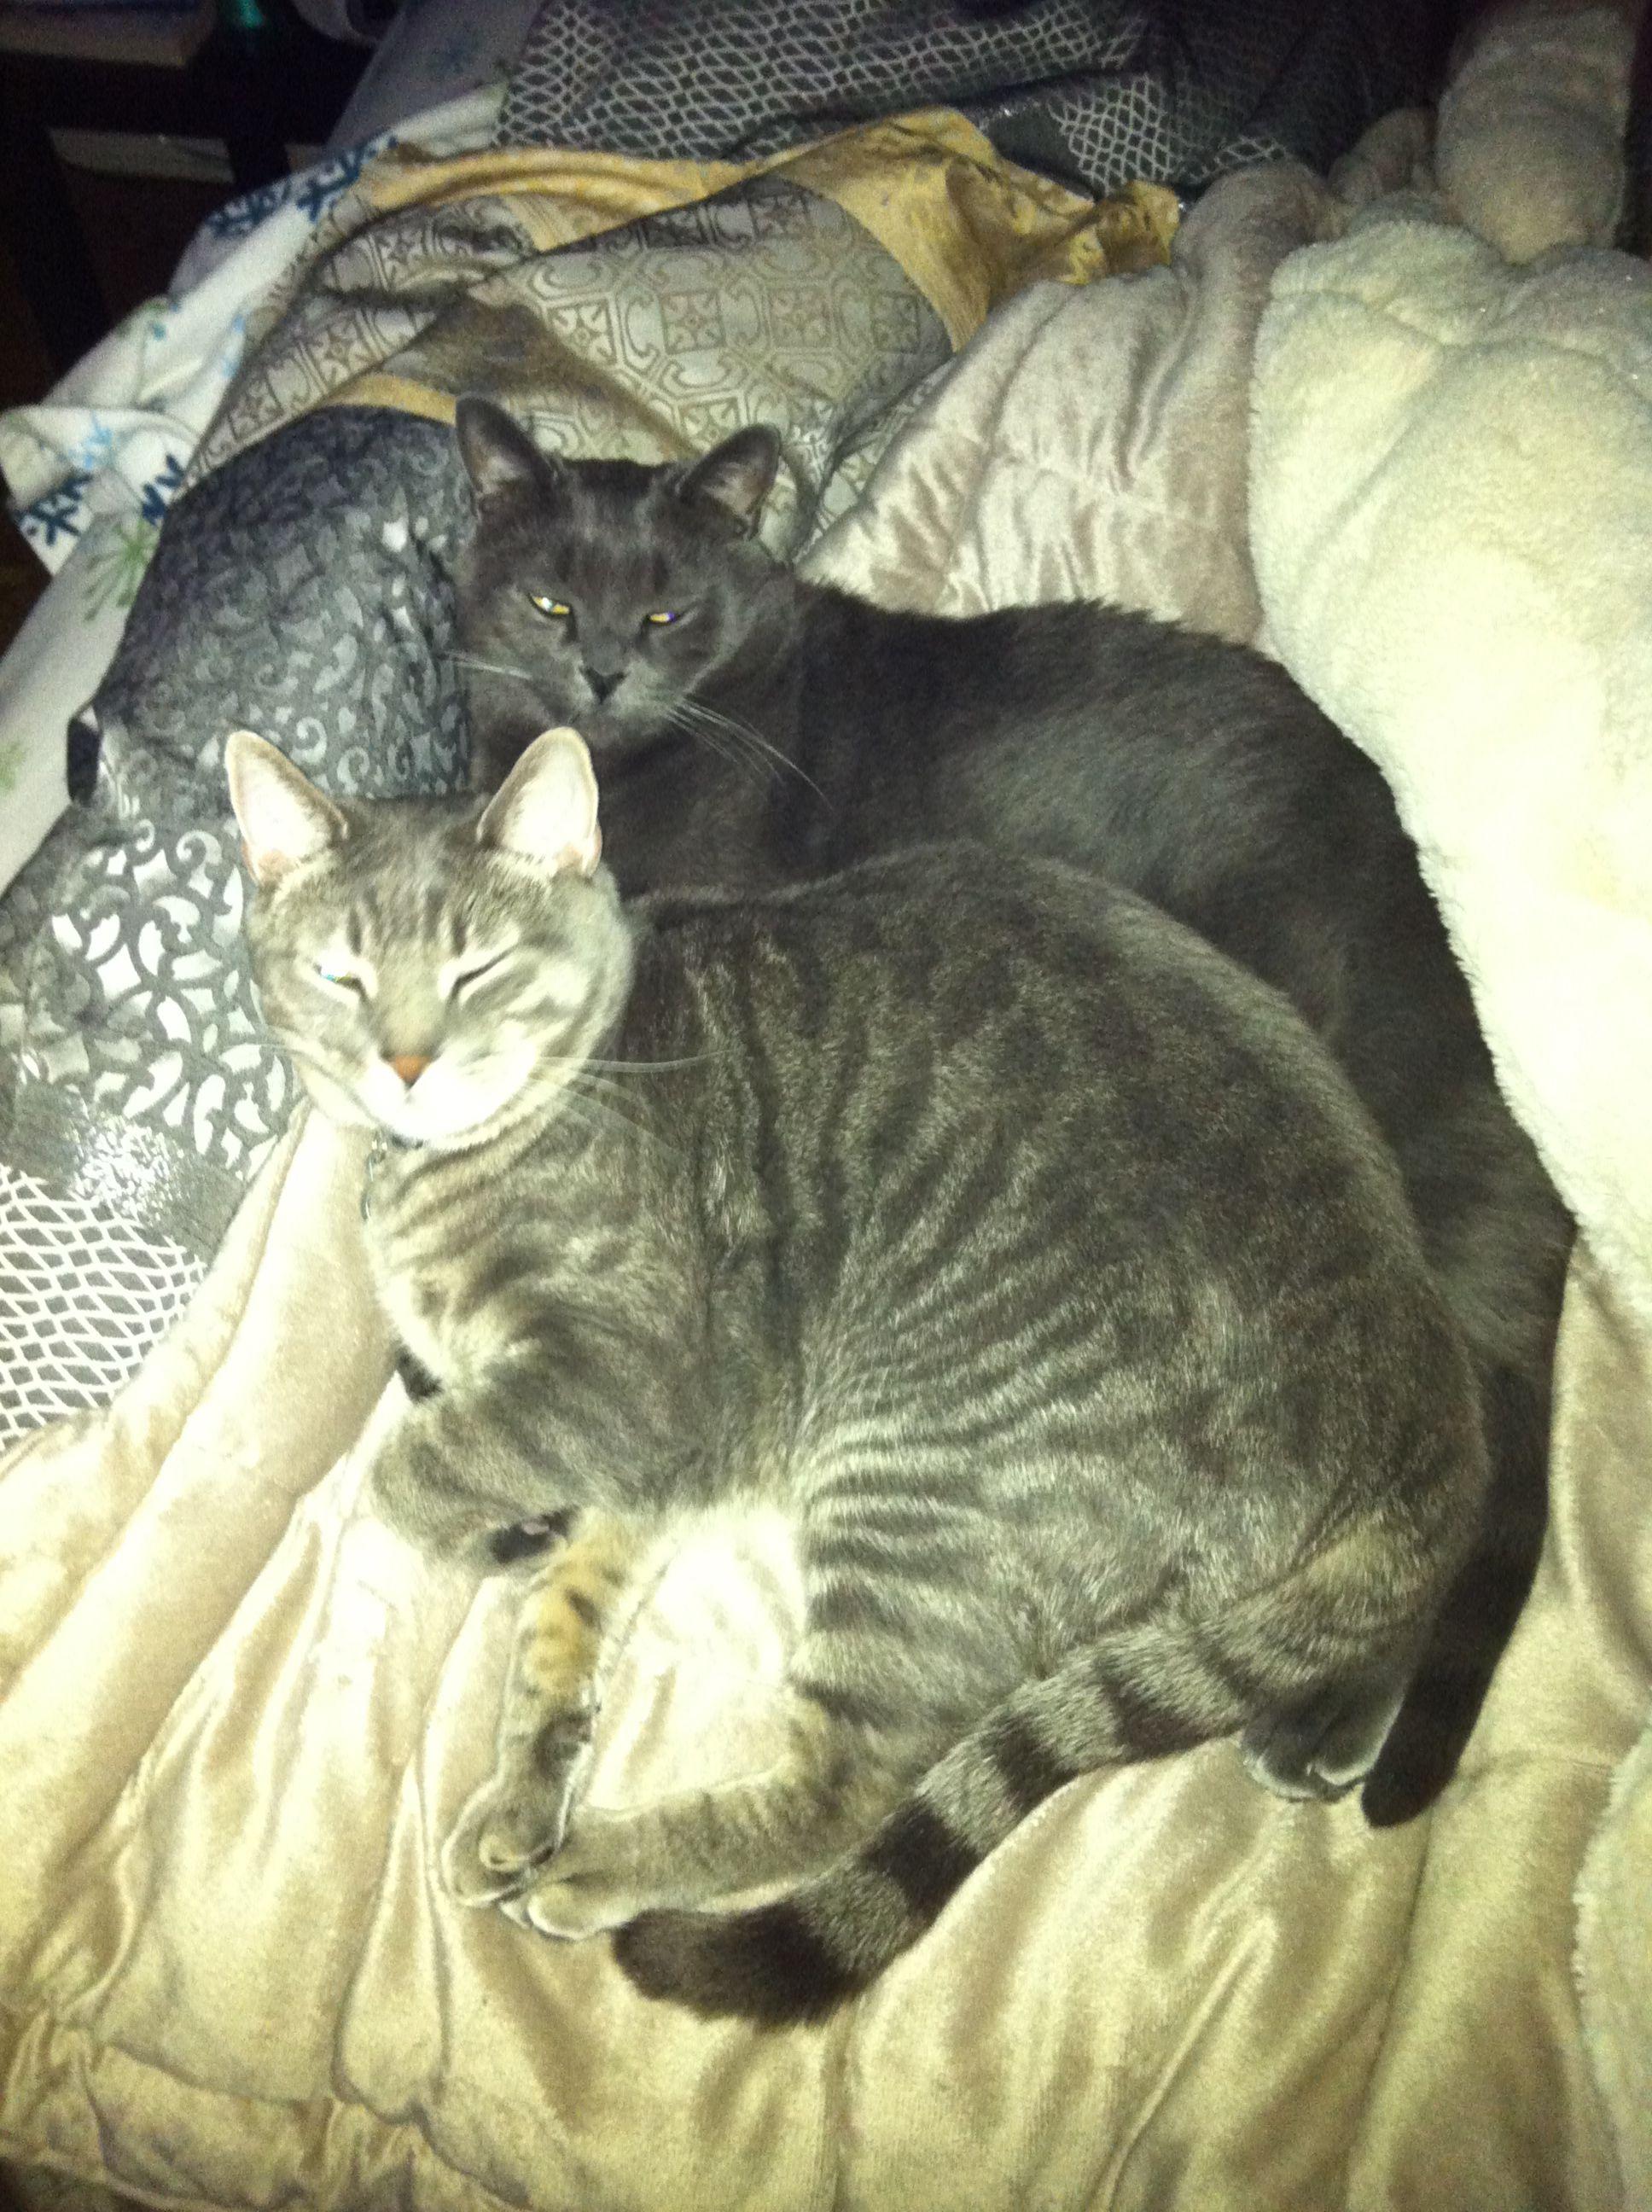 Cats spooning.